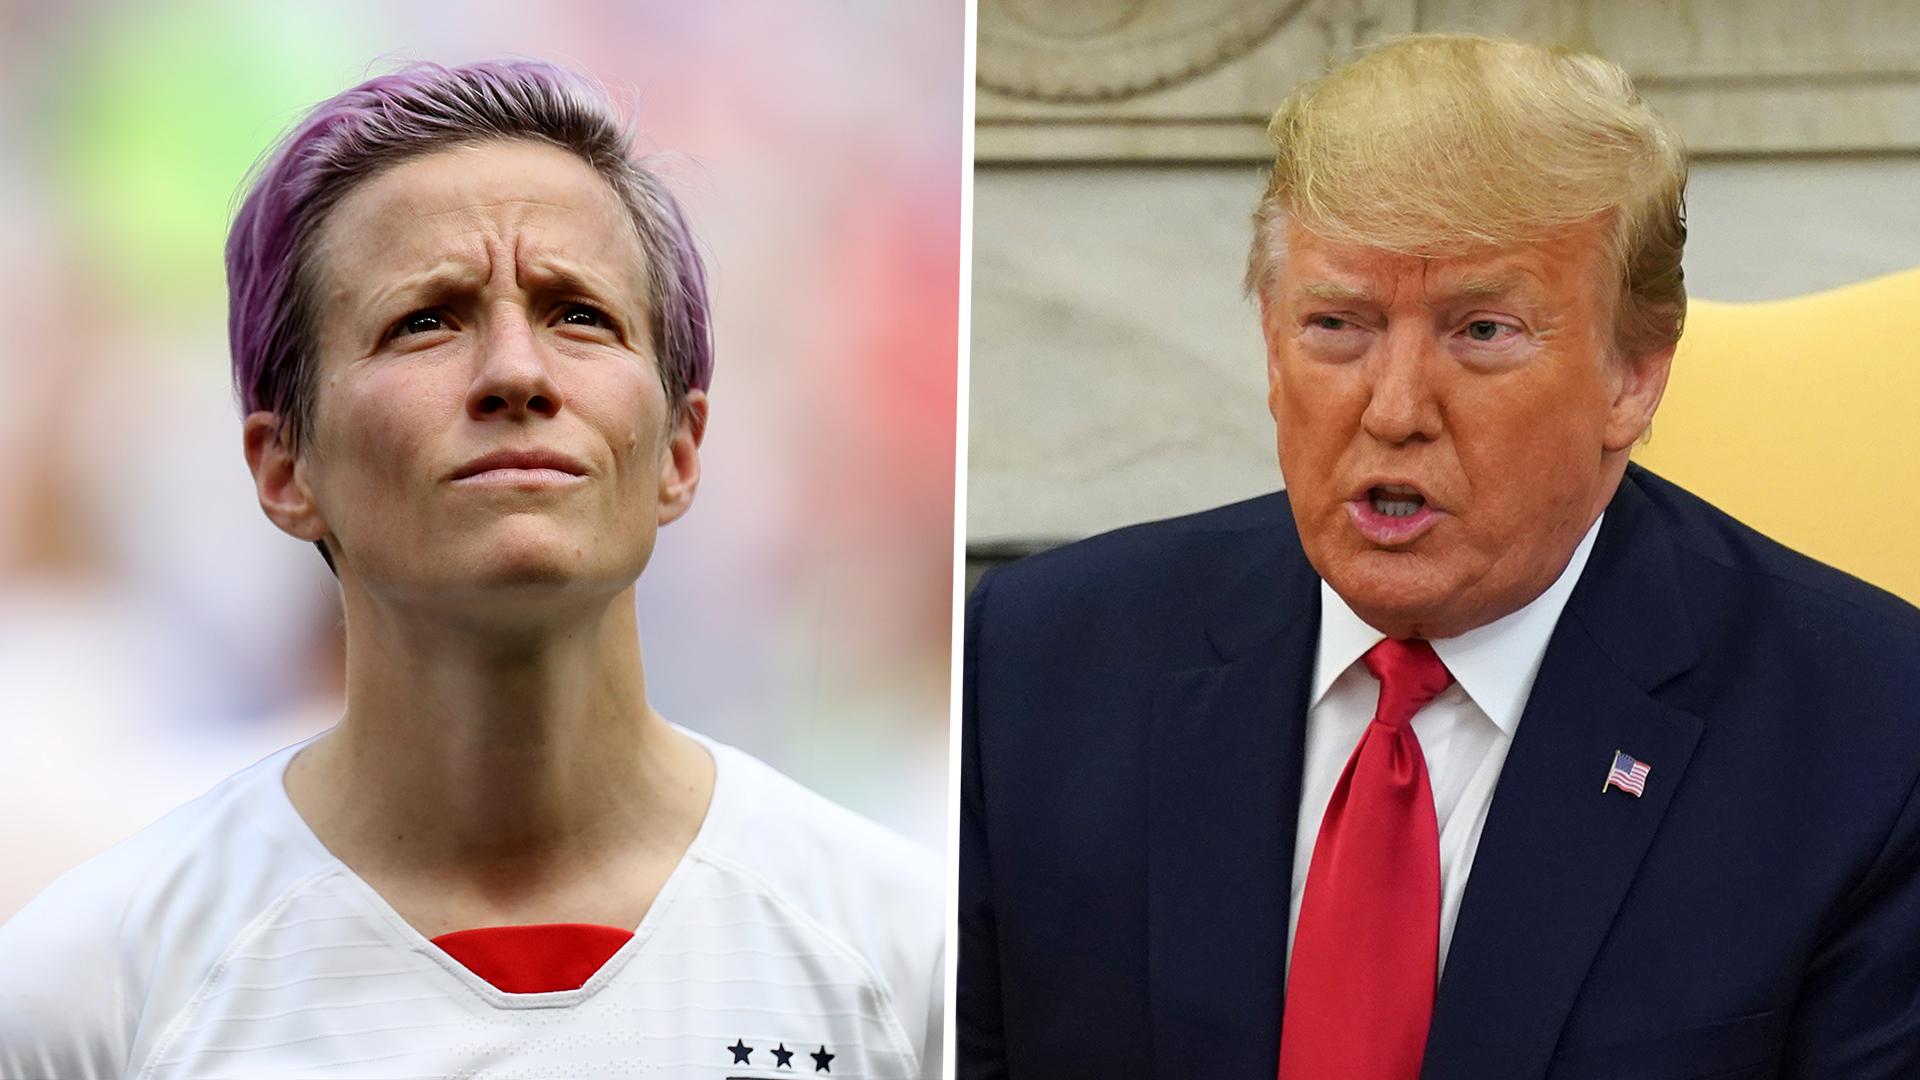 Rapinoe tells Trump: You need to do better